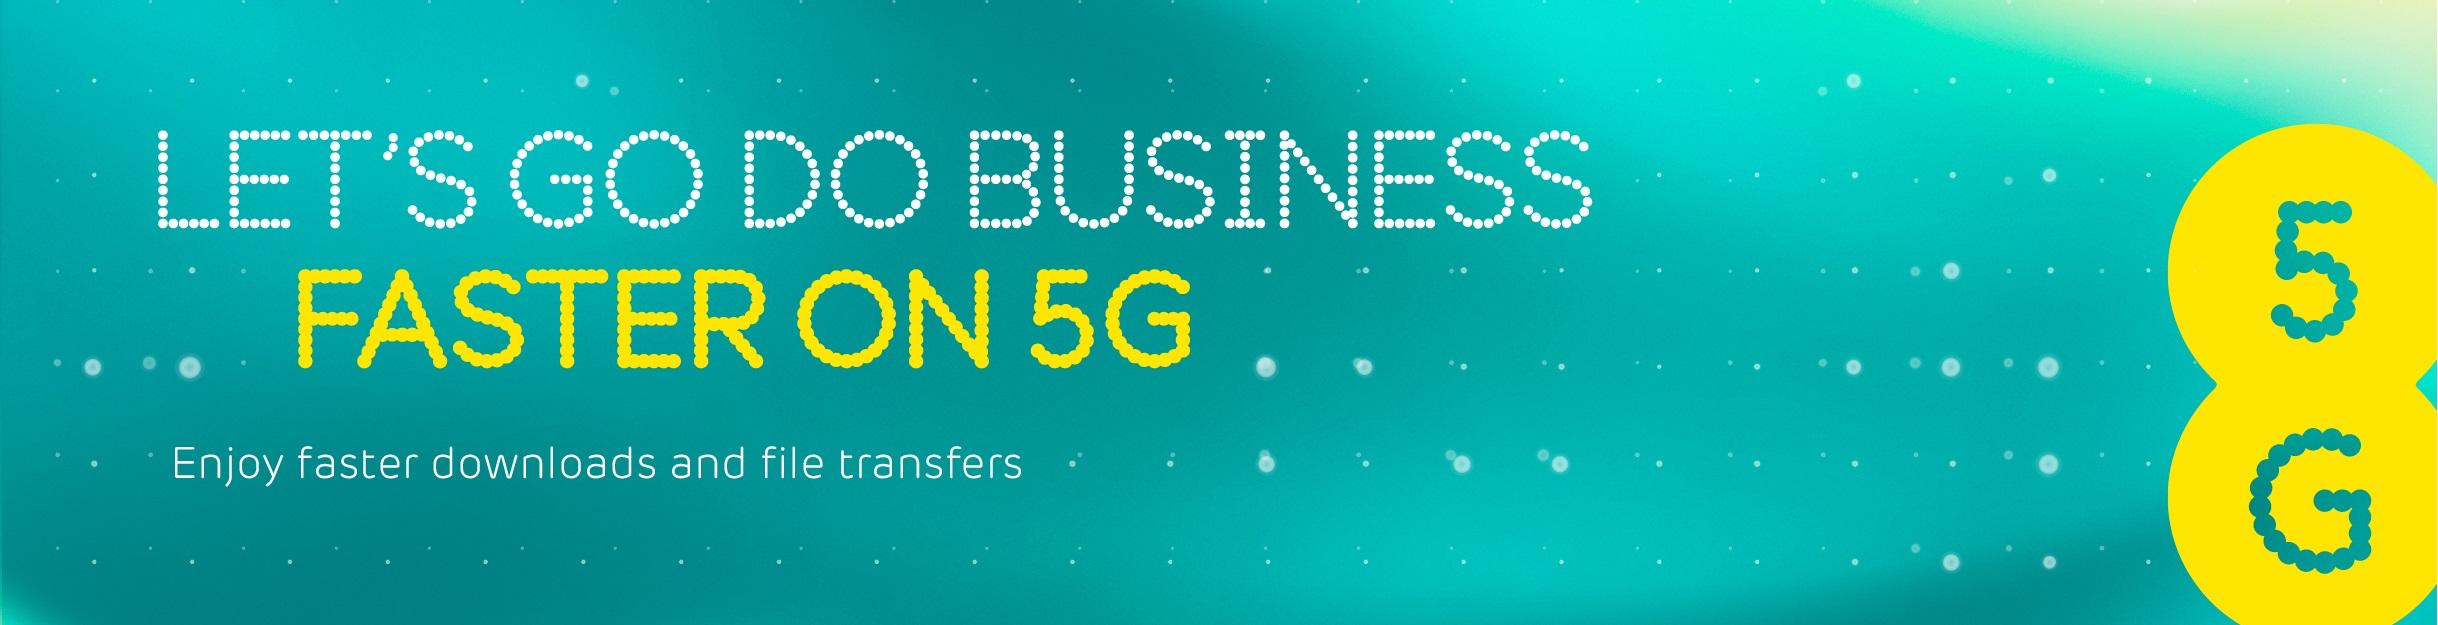 Let's do good business faster on 5G - Web banner